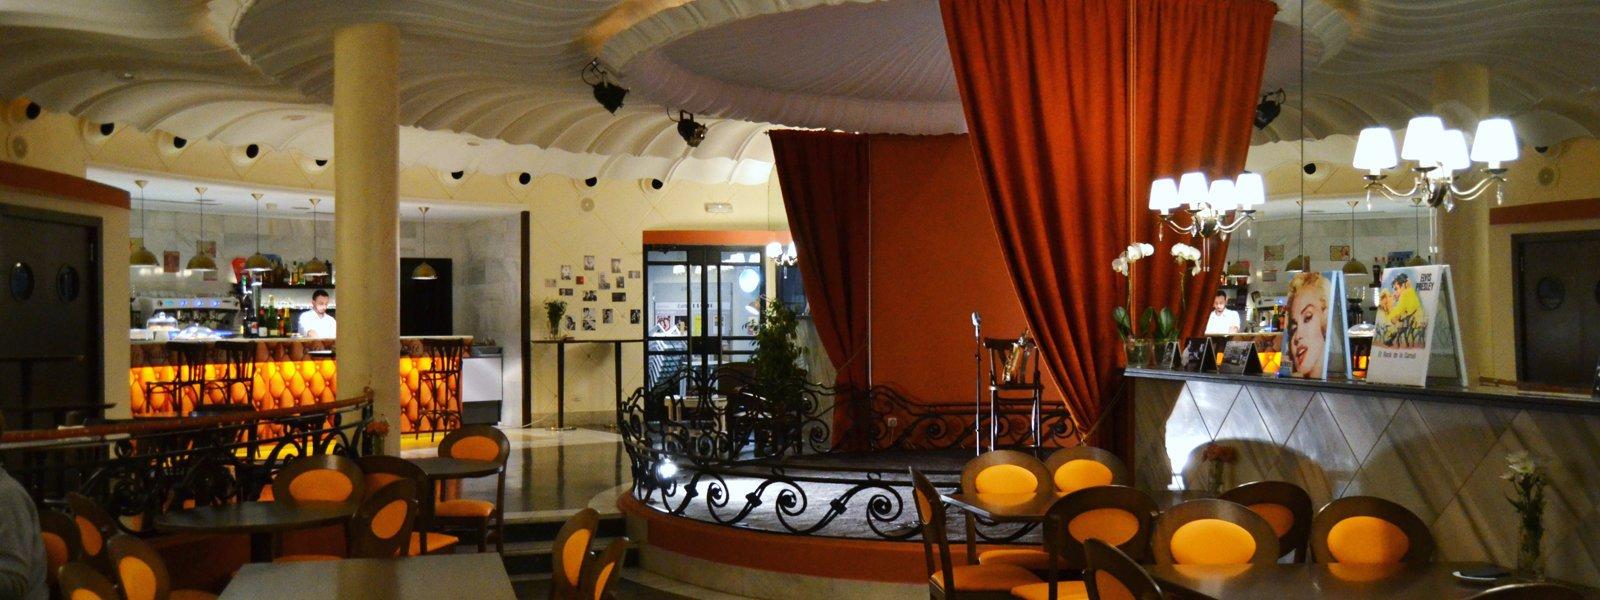 Teatre Rialto, venue for shows representation